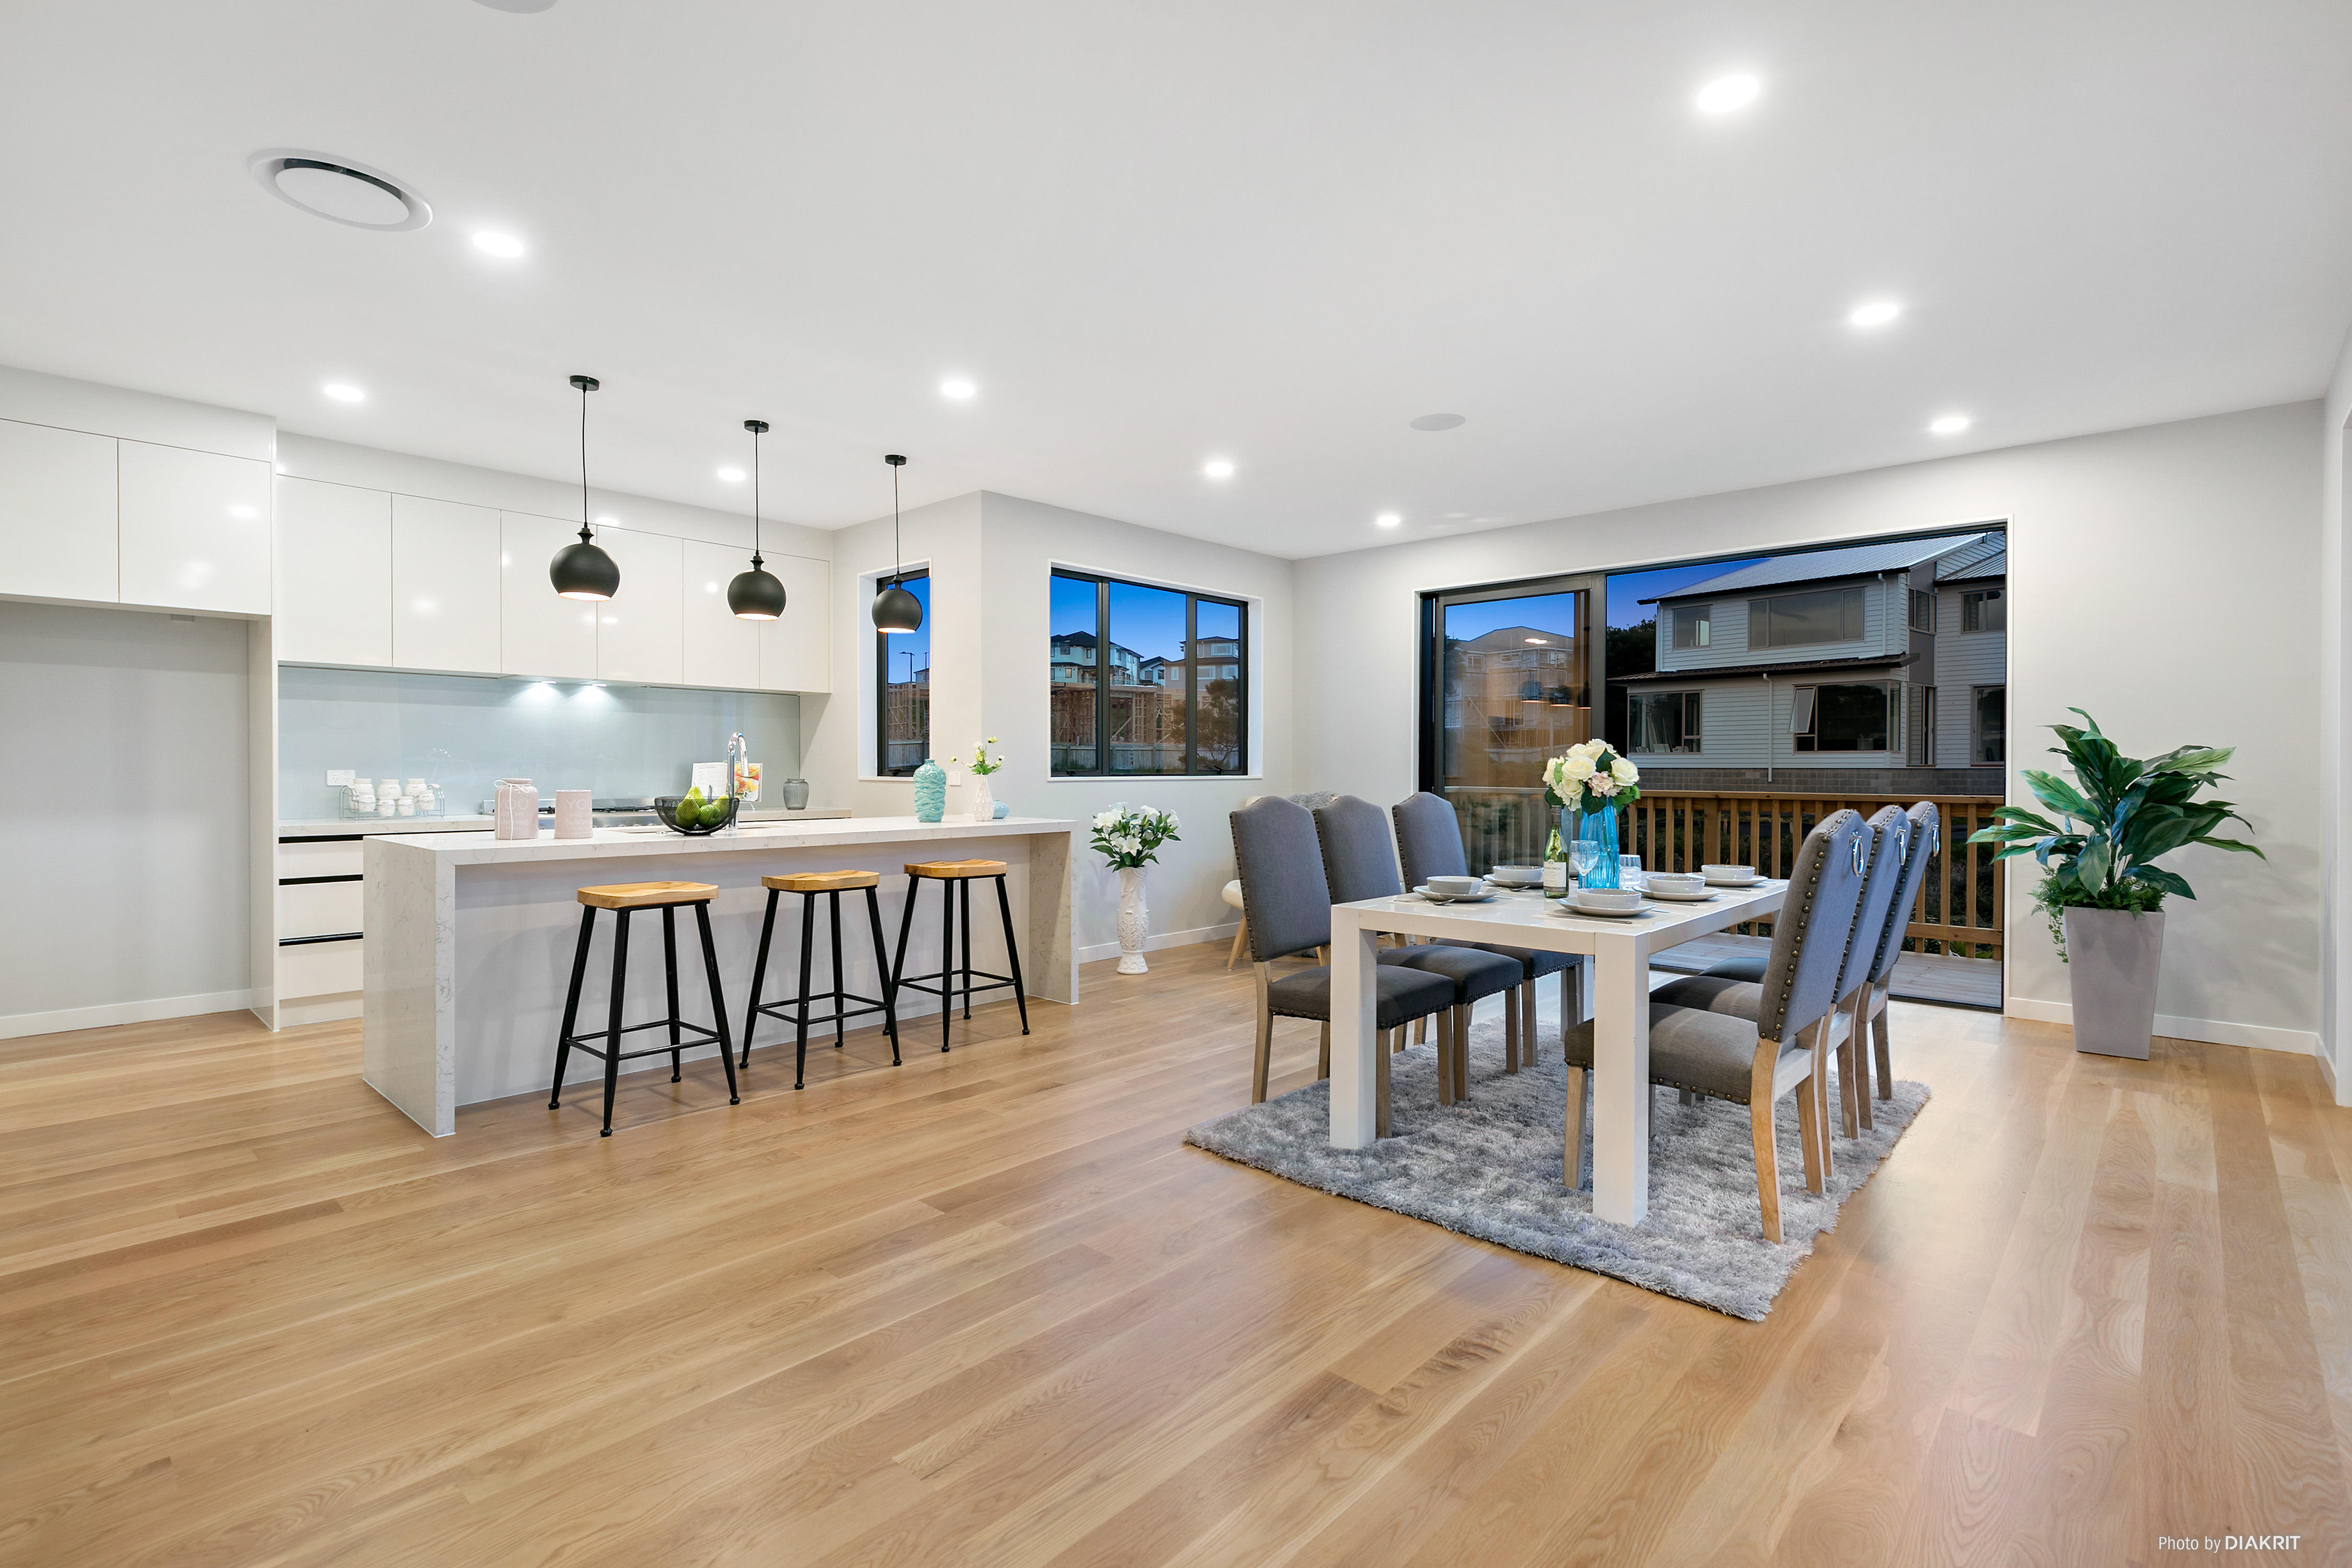 Pinehill 6房 现代化全新美宅 尽赏保护区风光 地处Rangitoto学区 步行至购物中心! Rangi Zoned Brand New House in Pinehill